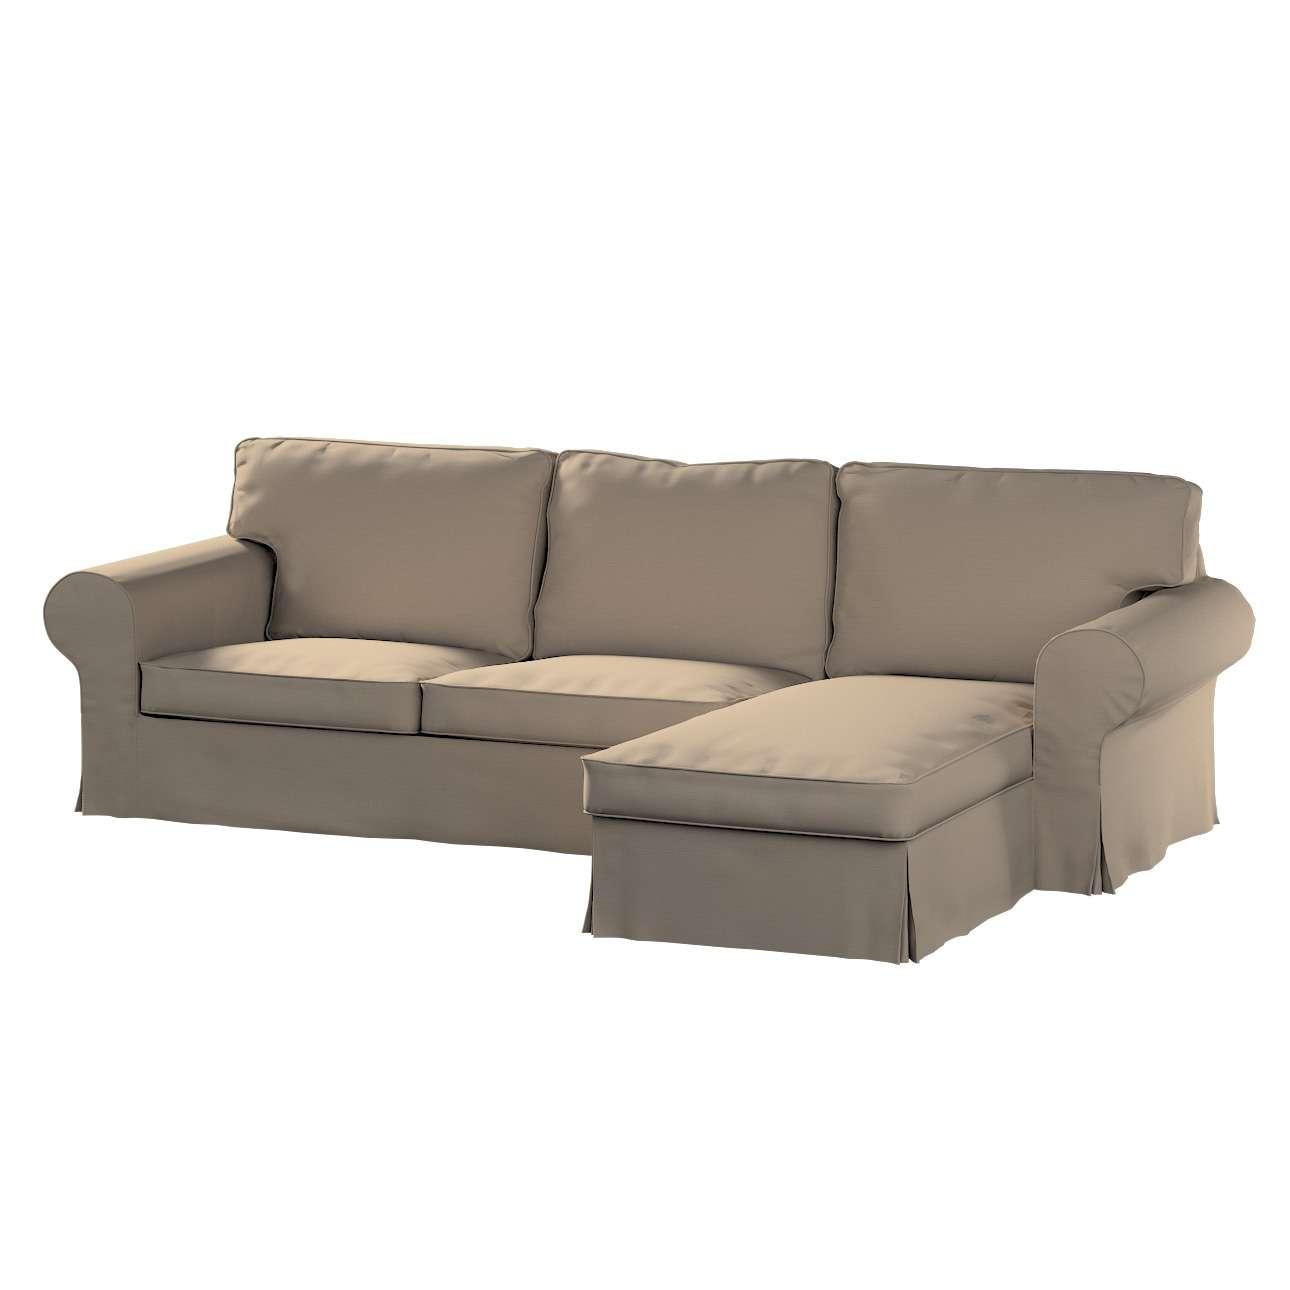 Ektorp 2-Sitzer Sofabezug mit Recamiere Ektorp 2-Sitzer Sofabezug mit Recamiere von der Kollektion Cotton Panama, Stoff: 702-28